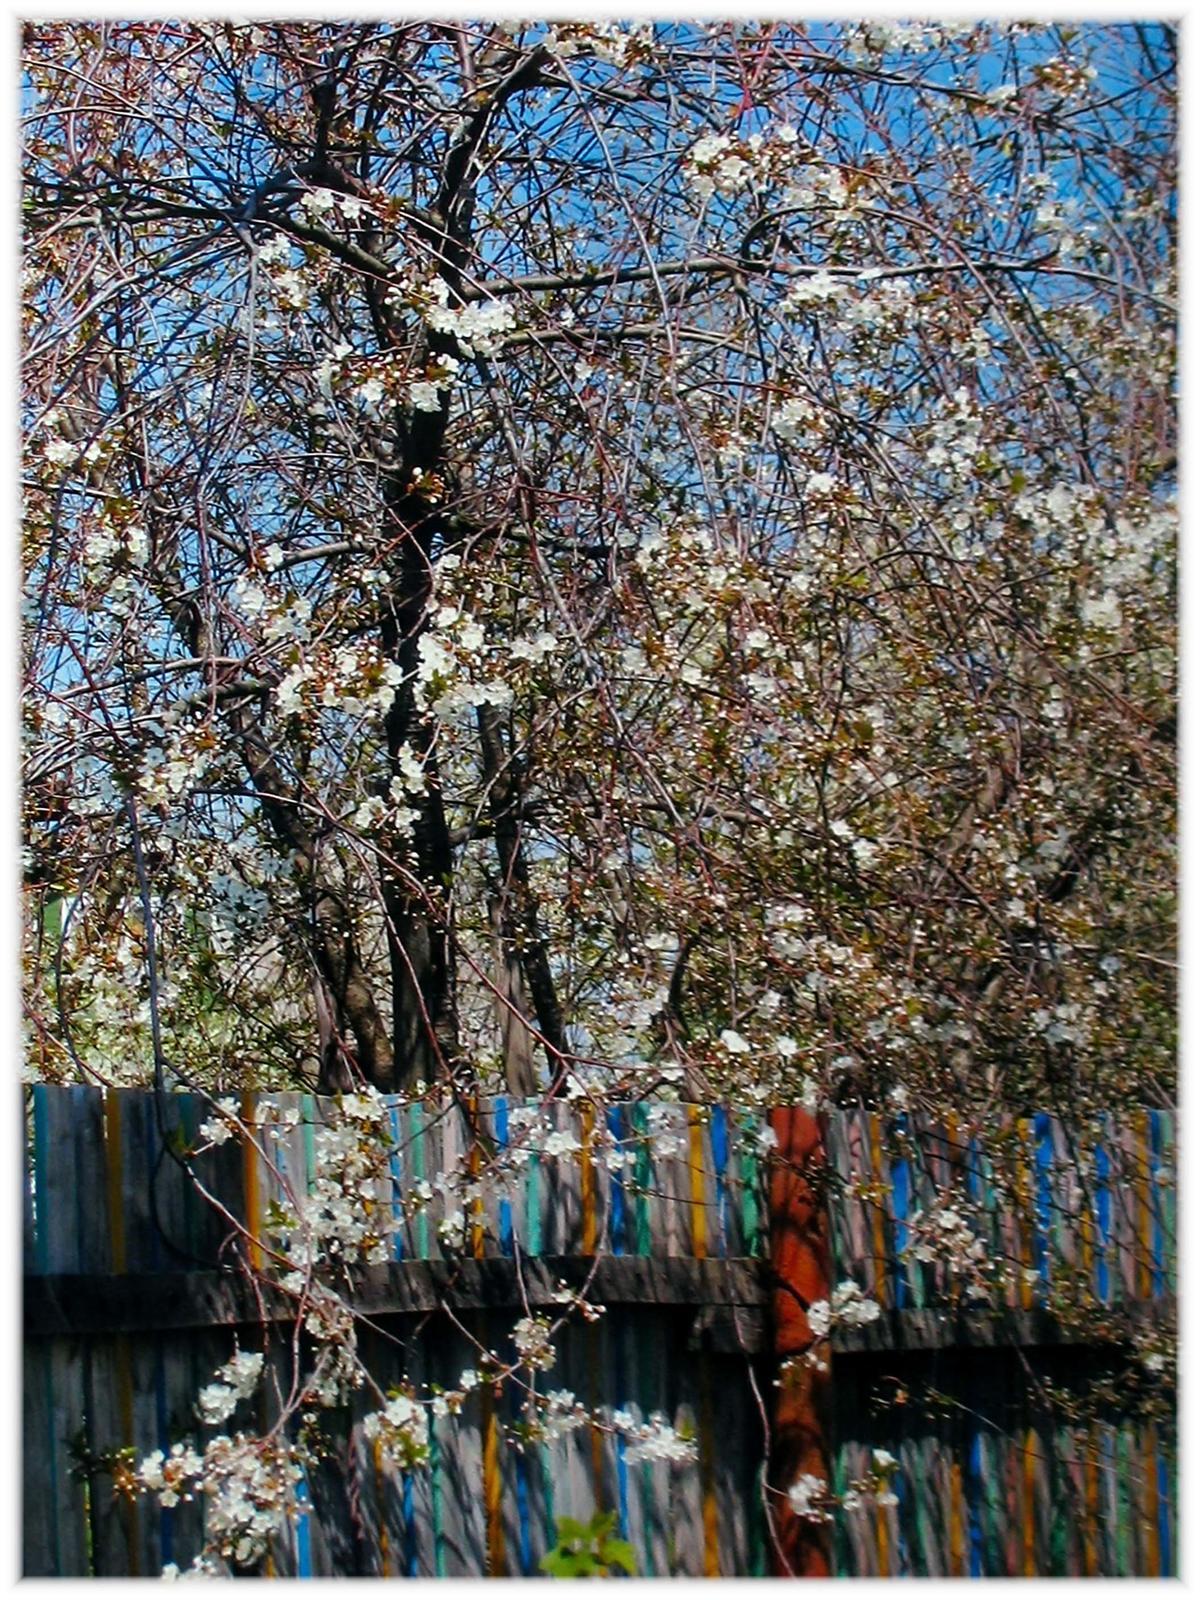 Фото №55313. 18. Вишневый сад